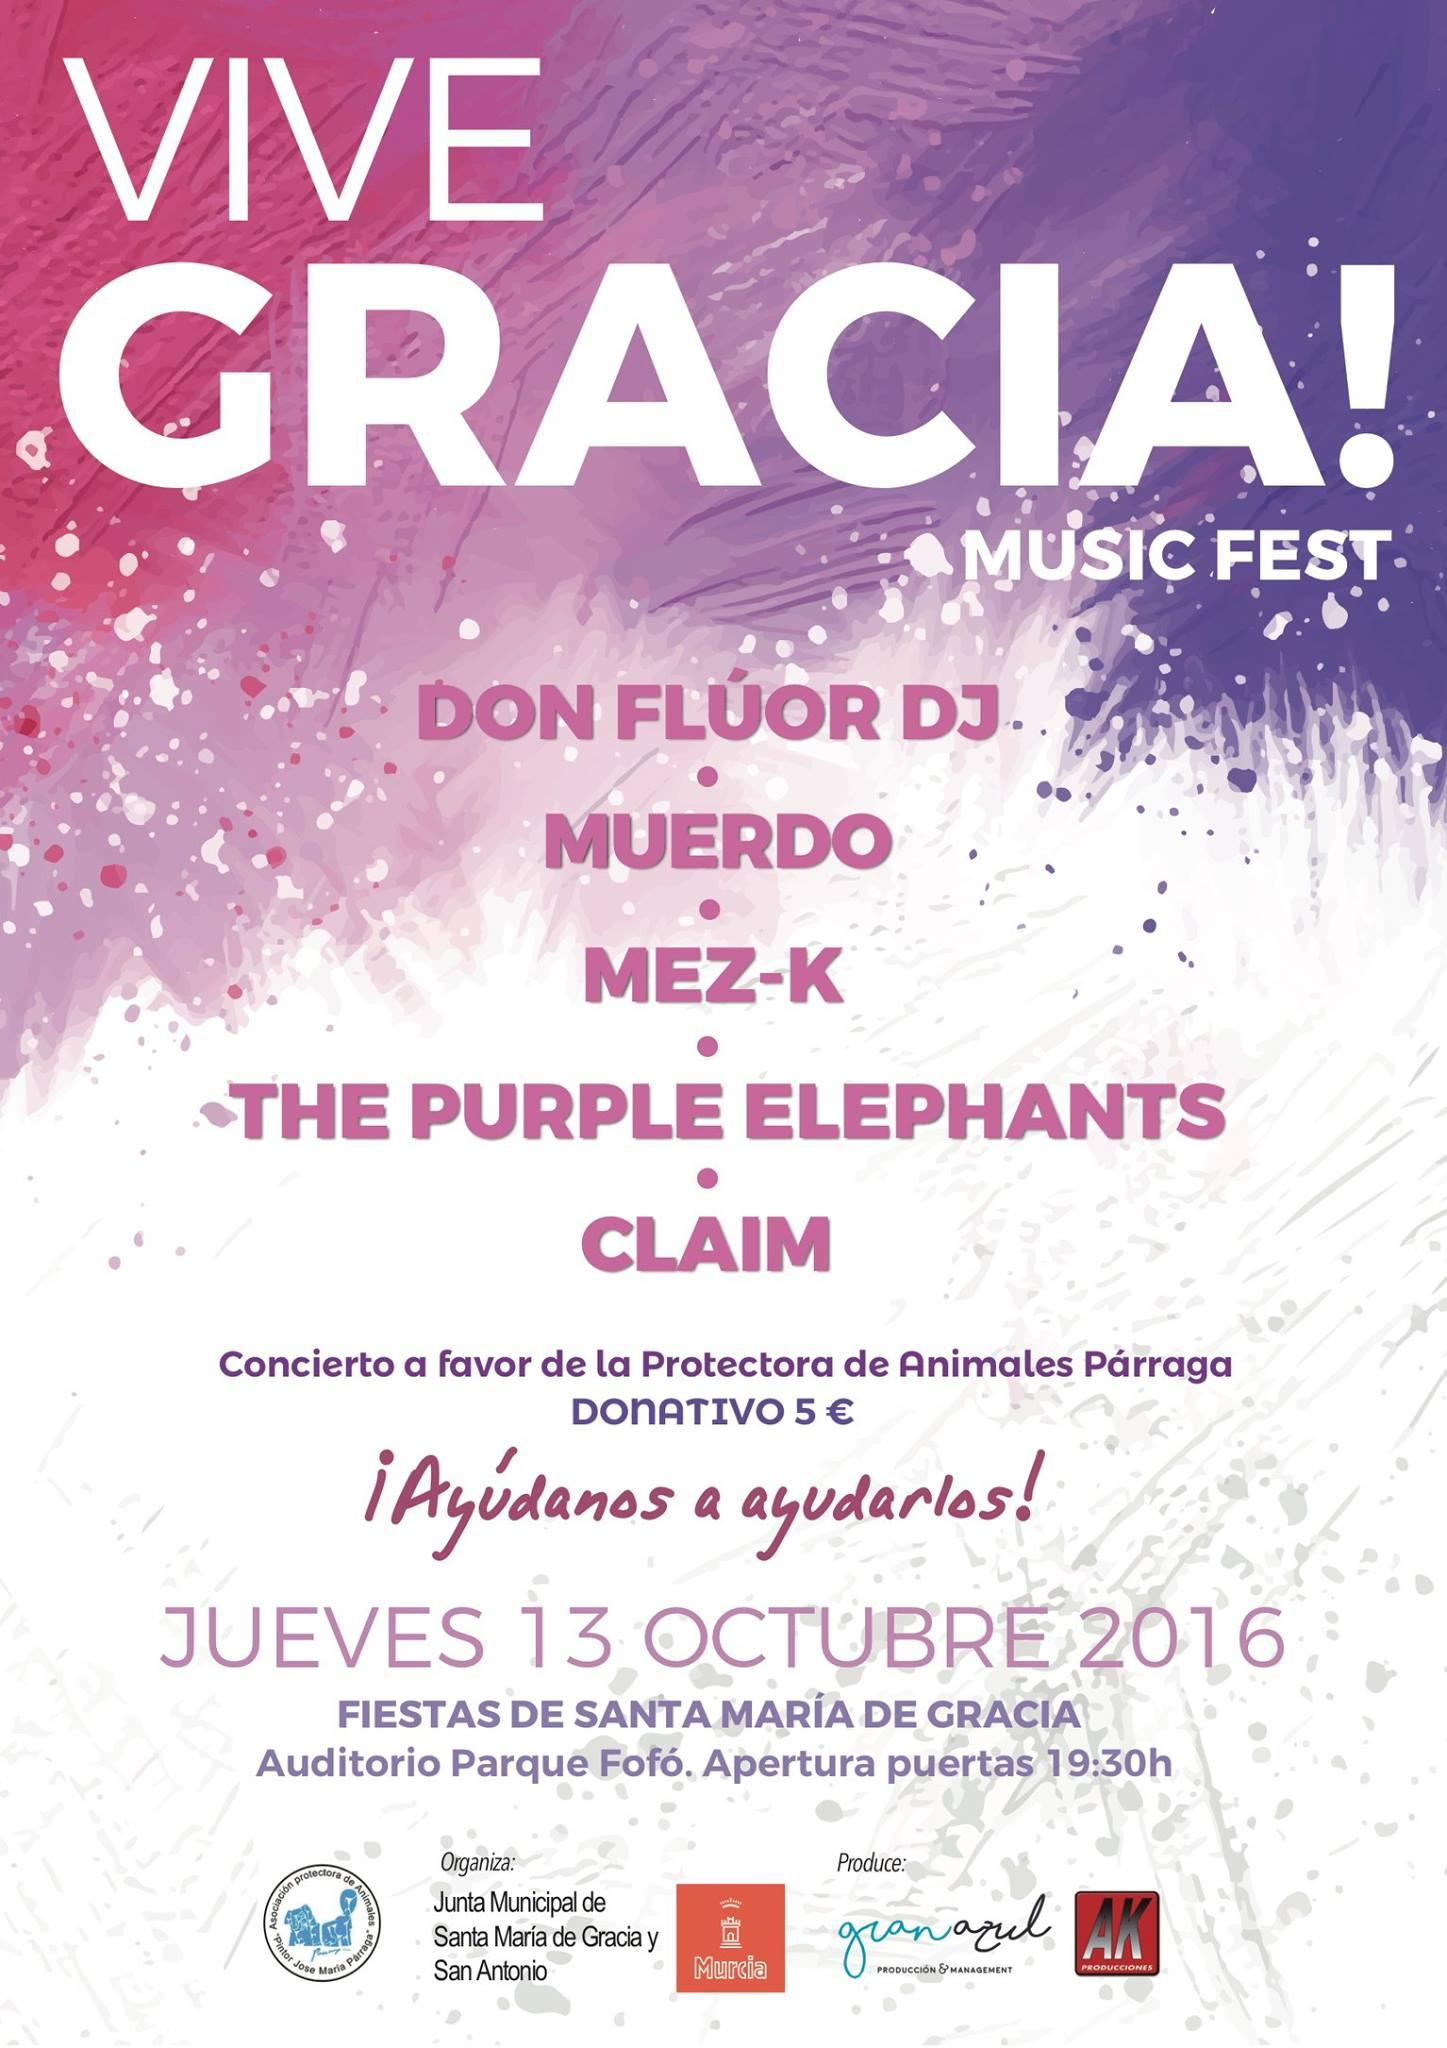 VIVE GRACIA! Music Fest, música solidaria con Muerdo, Claim, Mez-K, The Purple Elephants y Don Flúor